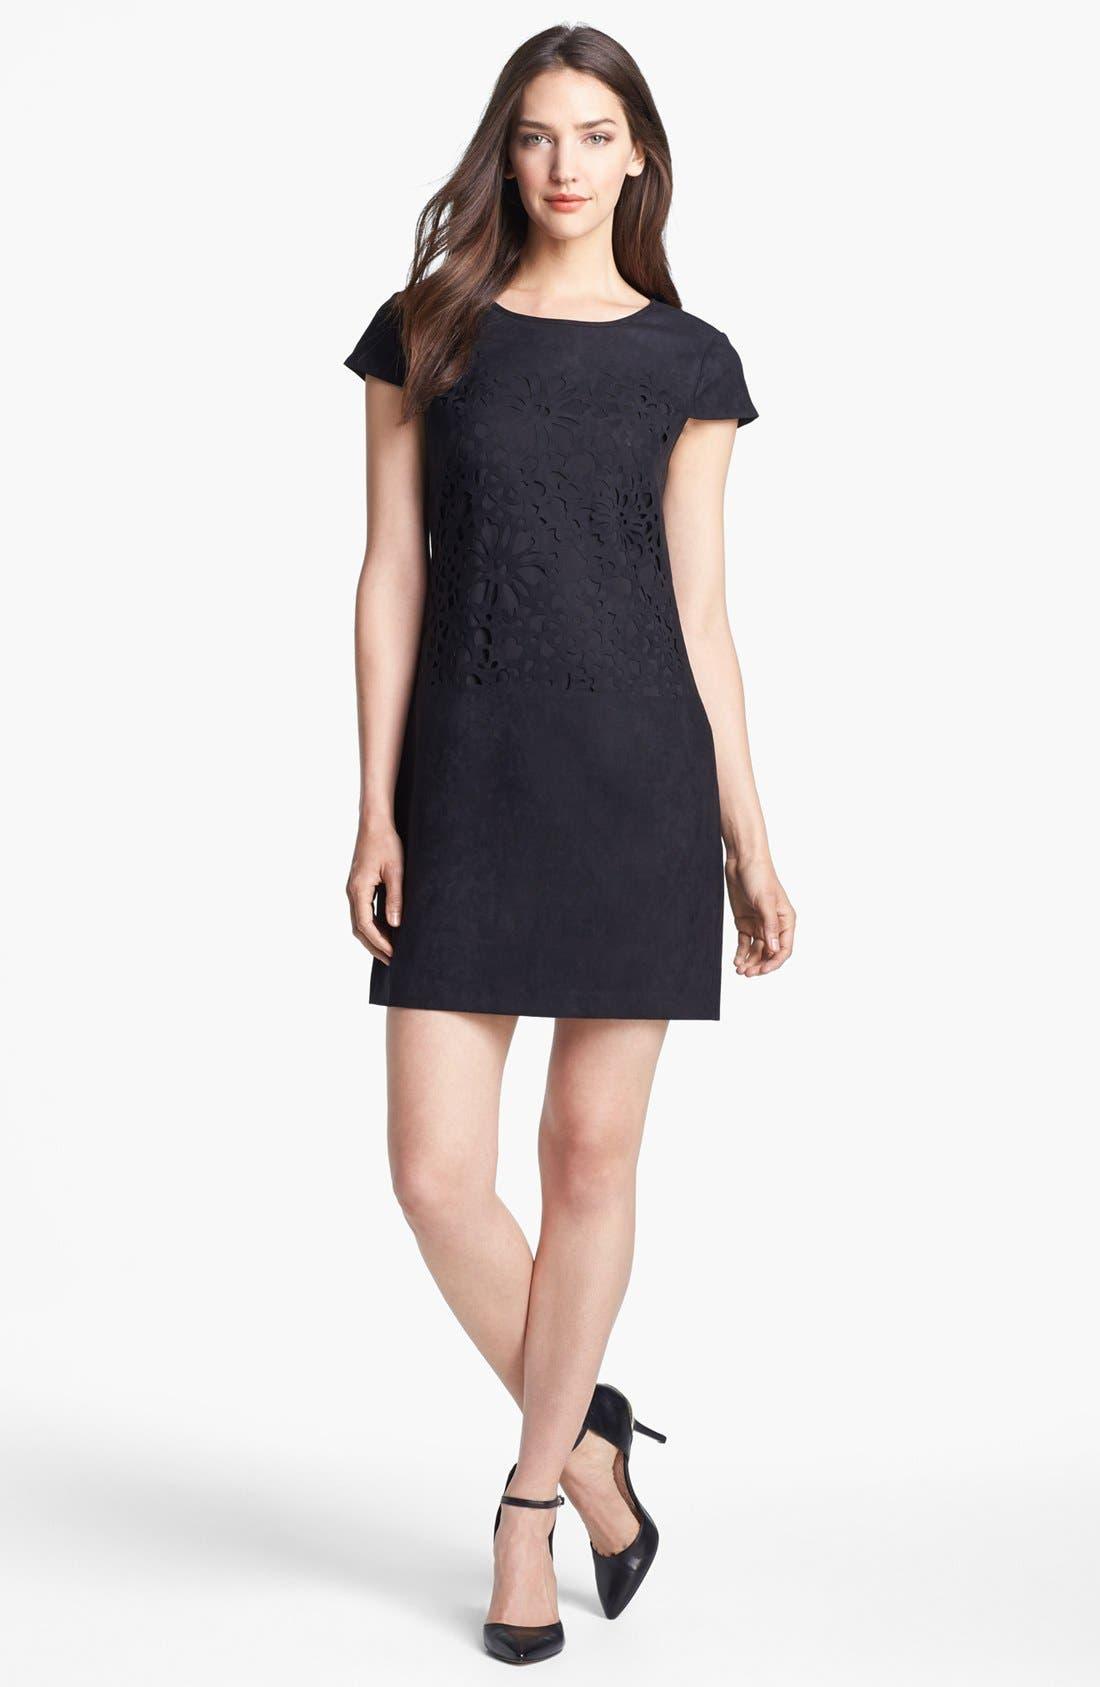 Main Image - Jessica Simpson Laser Cut Faux Suede Shift Dress (Online Only)